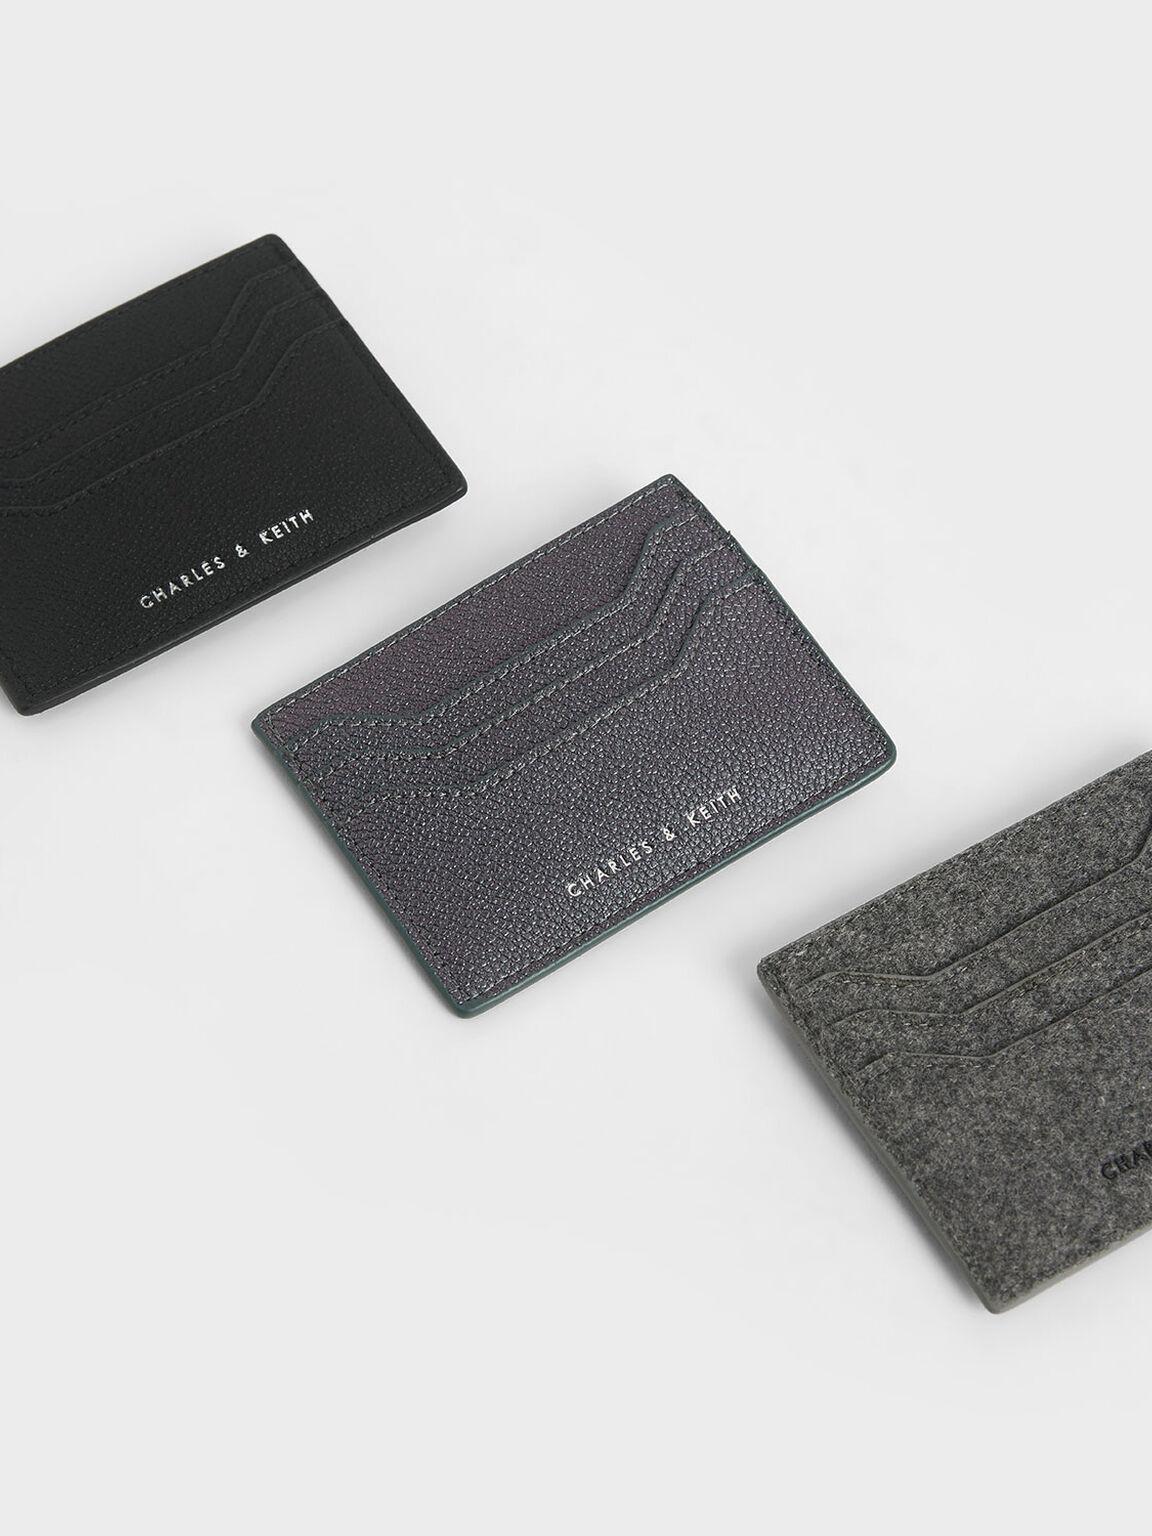 Multi-Slot Card Holder, Peacock, hi-res